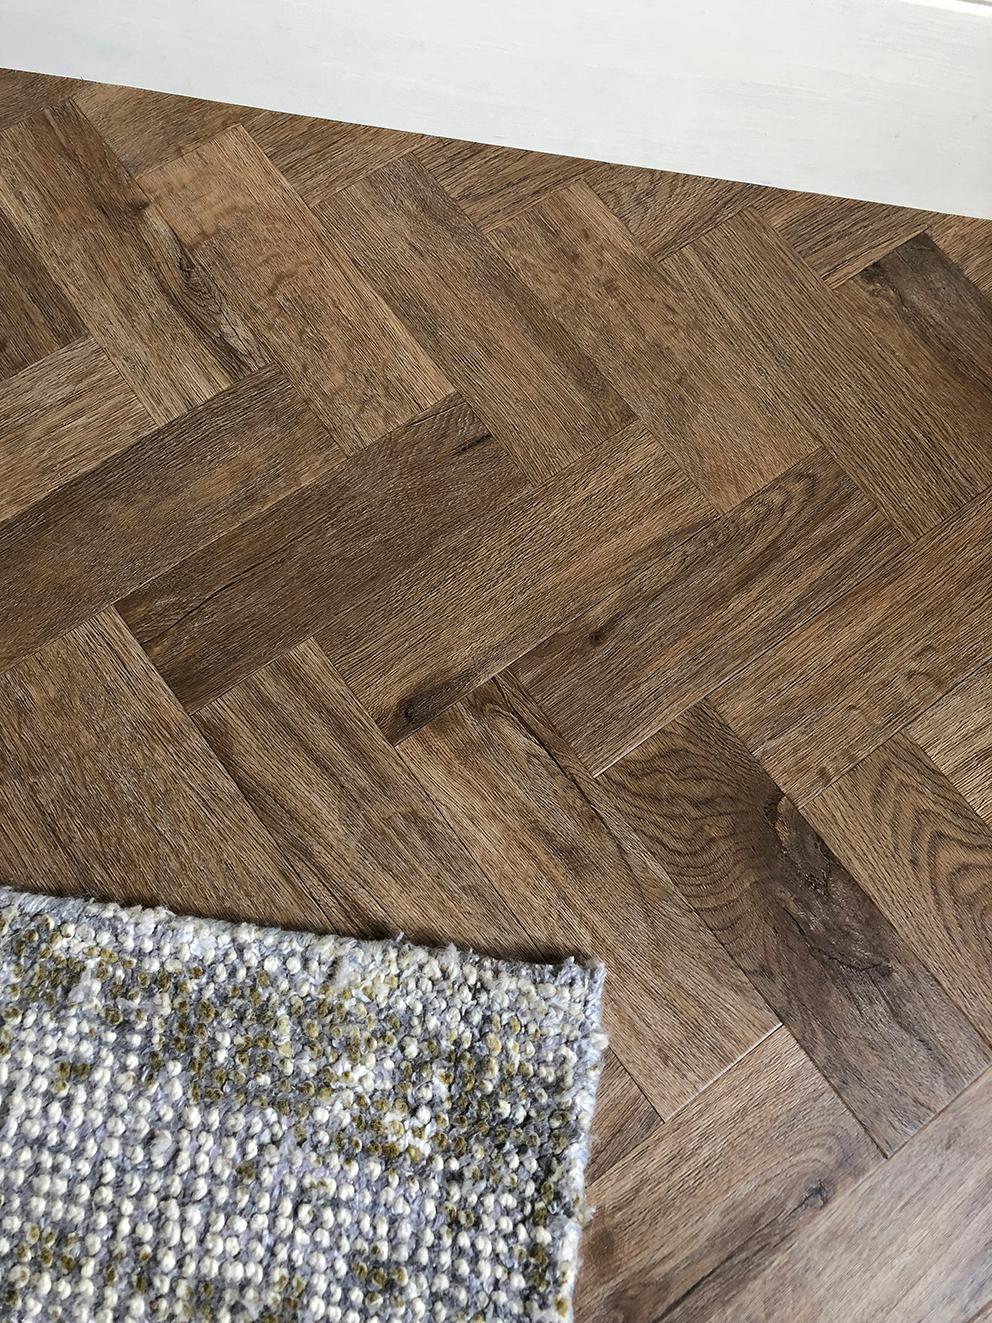 Amtico Flooring Installation AKA My Dream Parquet Floor - French For Pineapple Blog